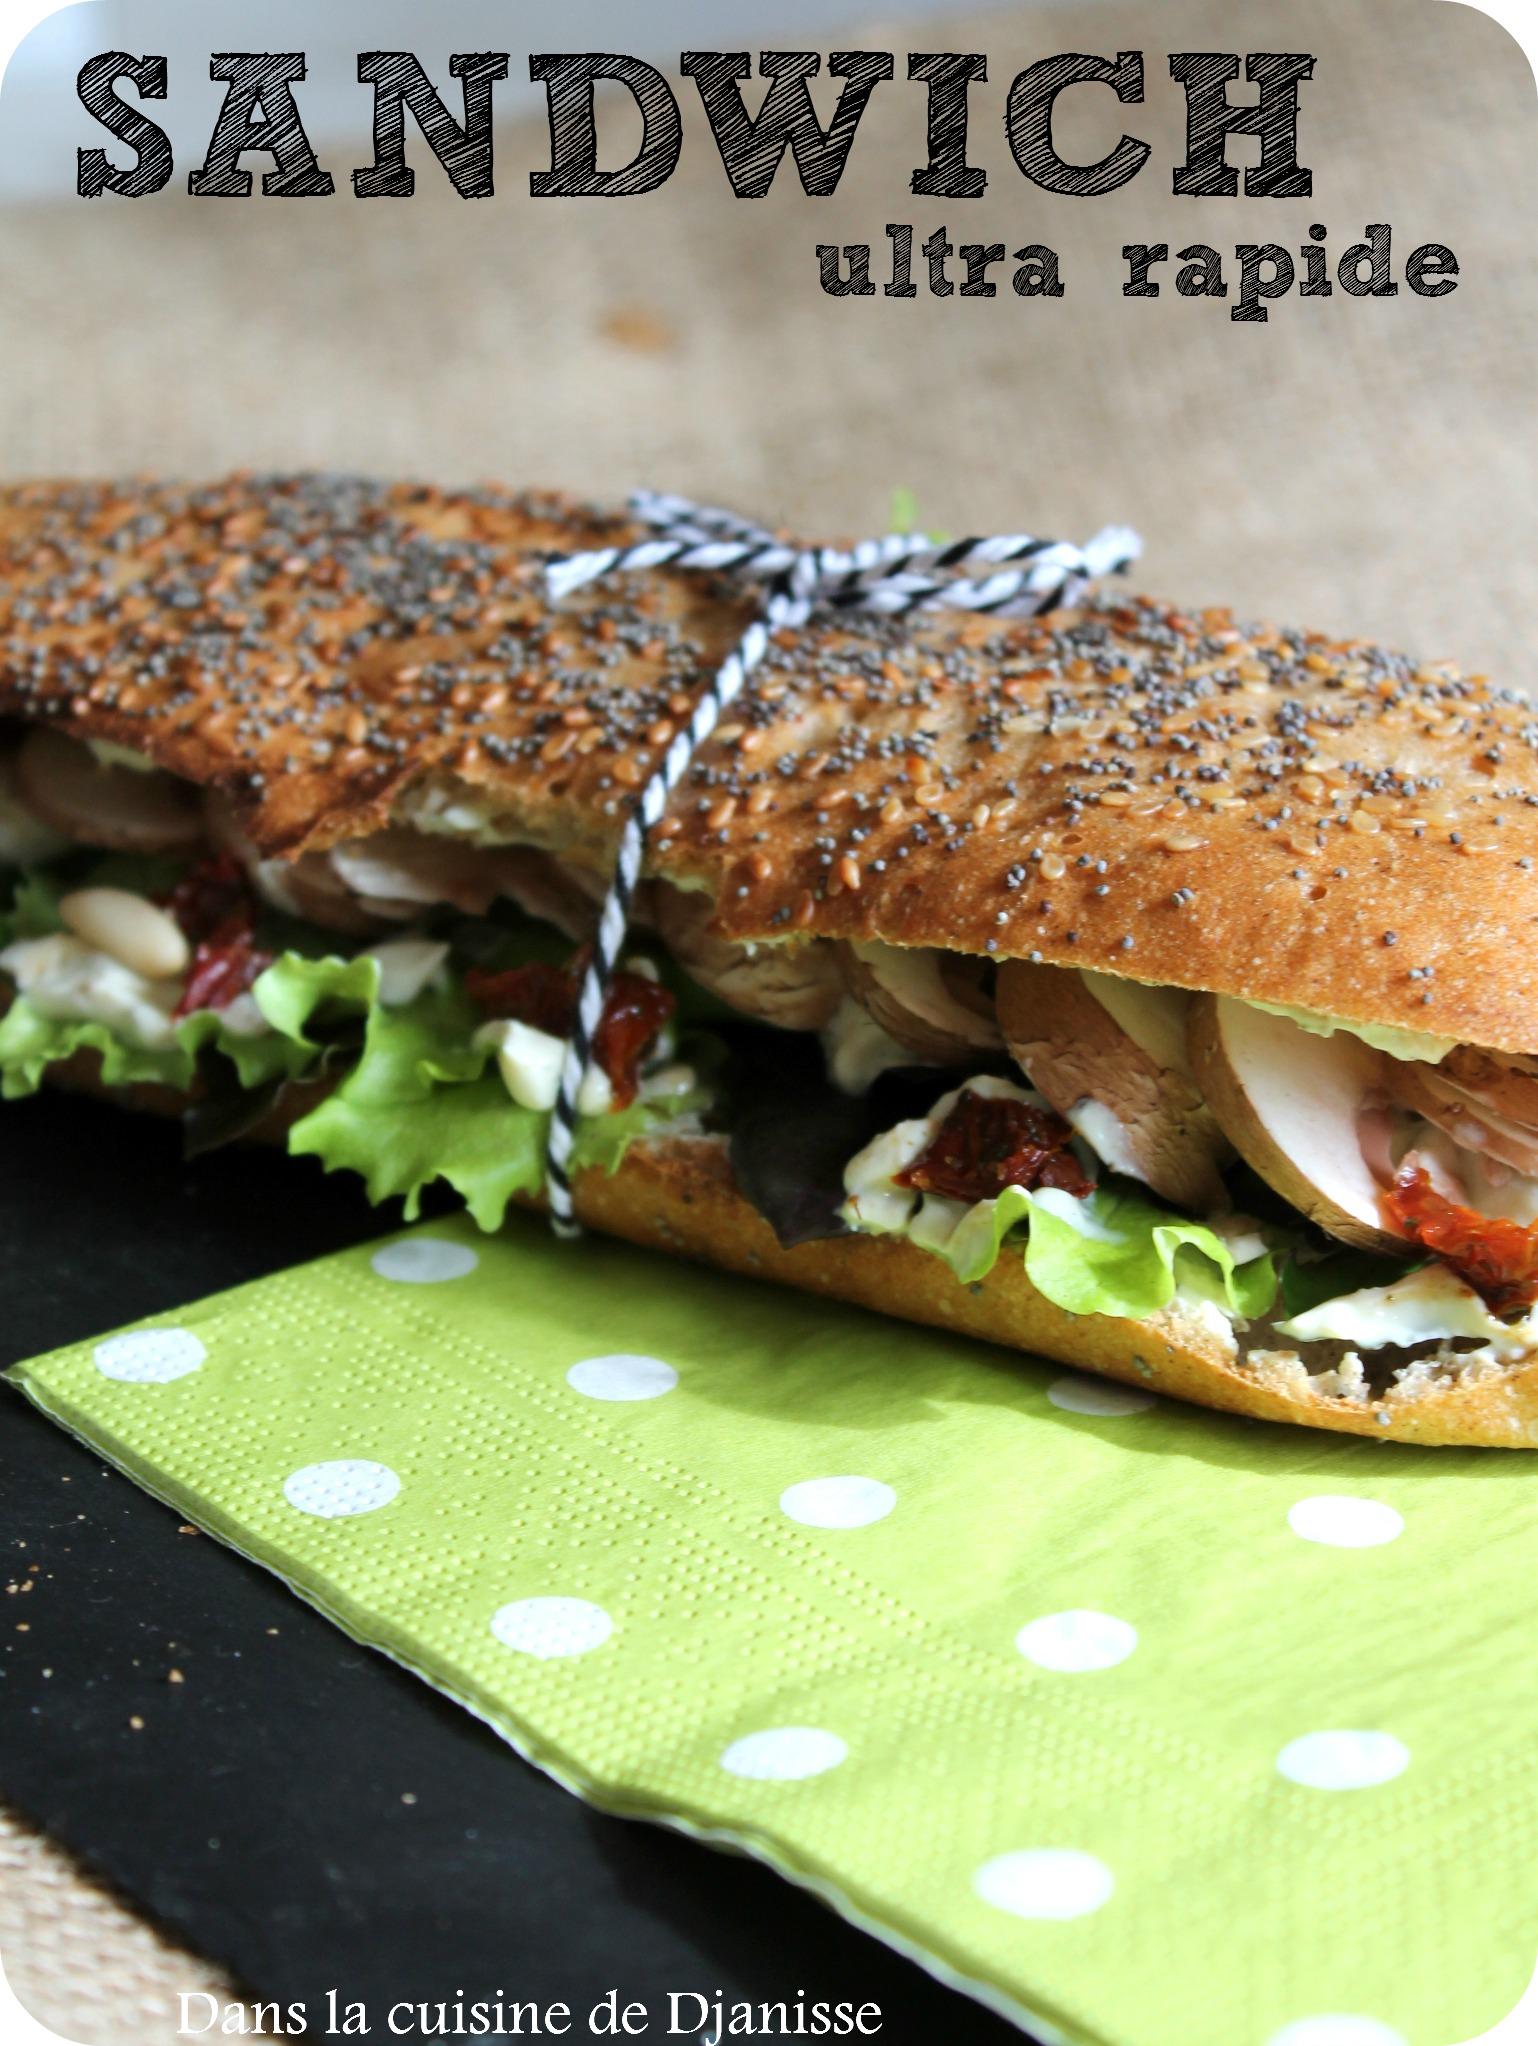 Sandwich ulta rapide